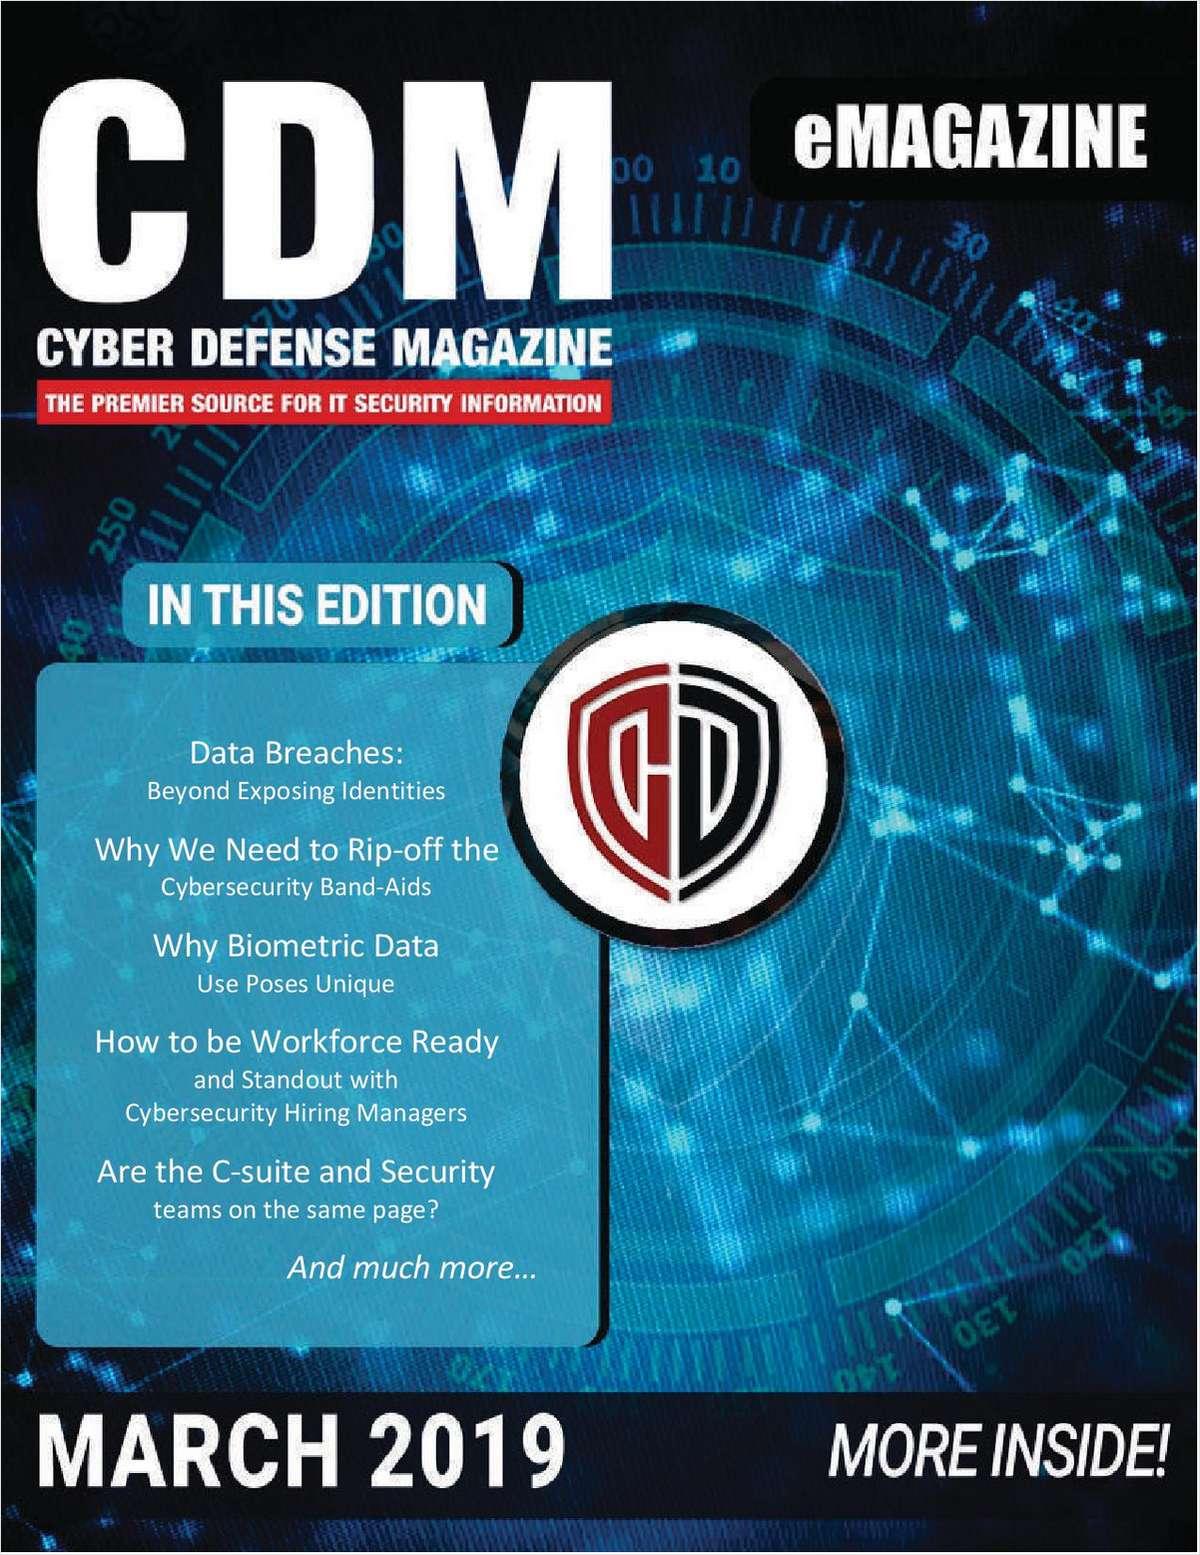 Cyber Defense eMagazine - Data Breaches Beyond Exposing Identities - March 2019 Edition Screenshot